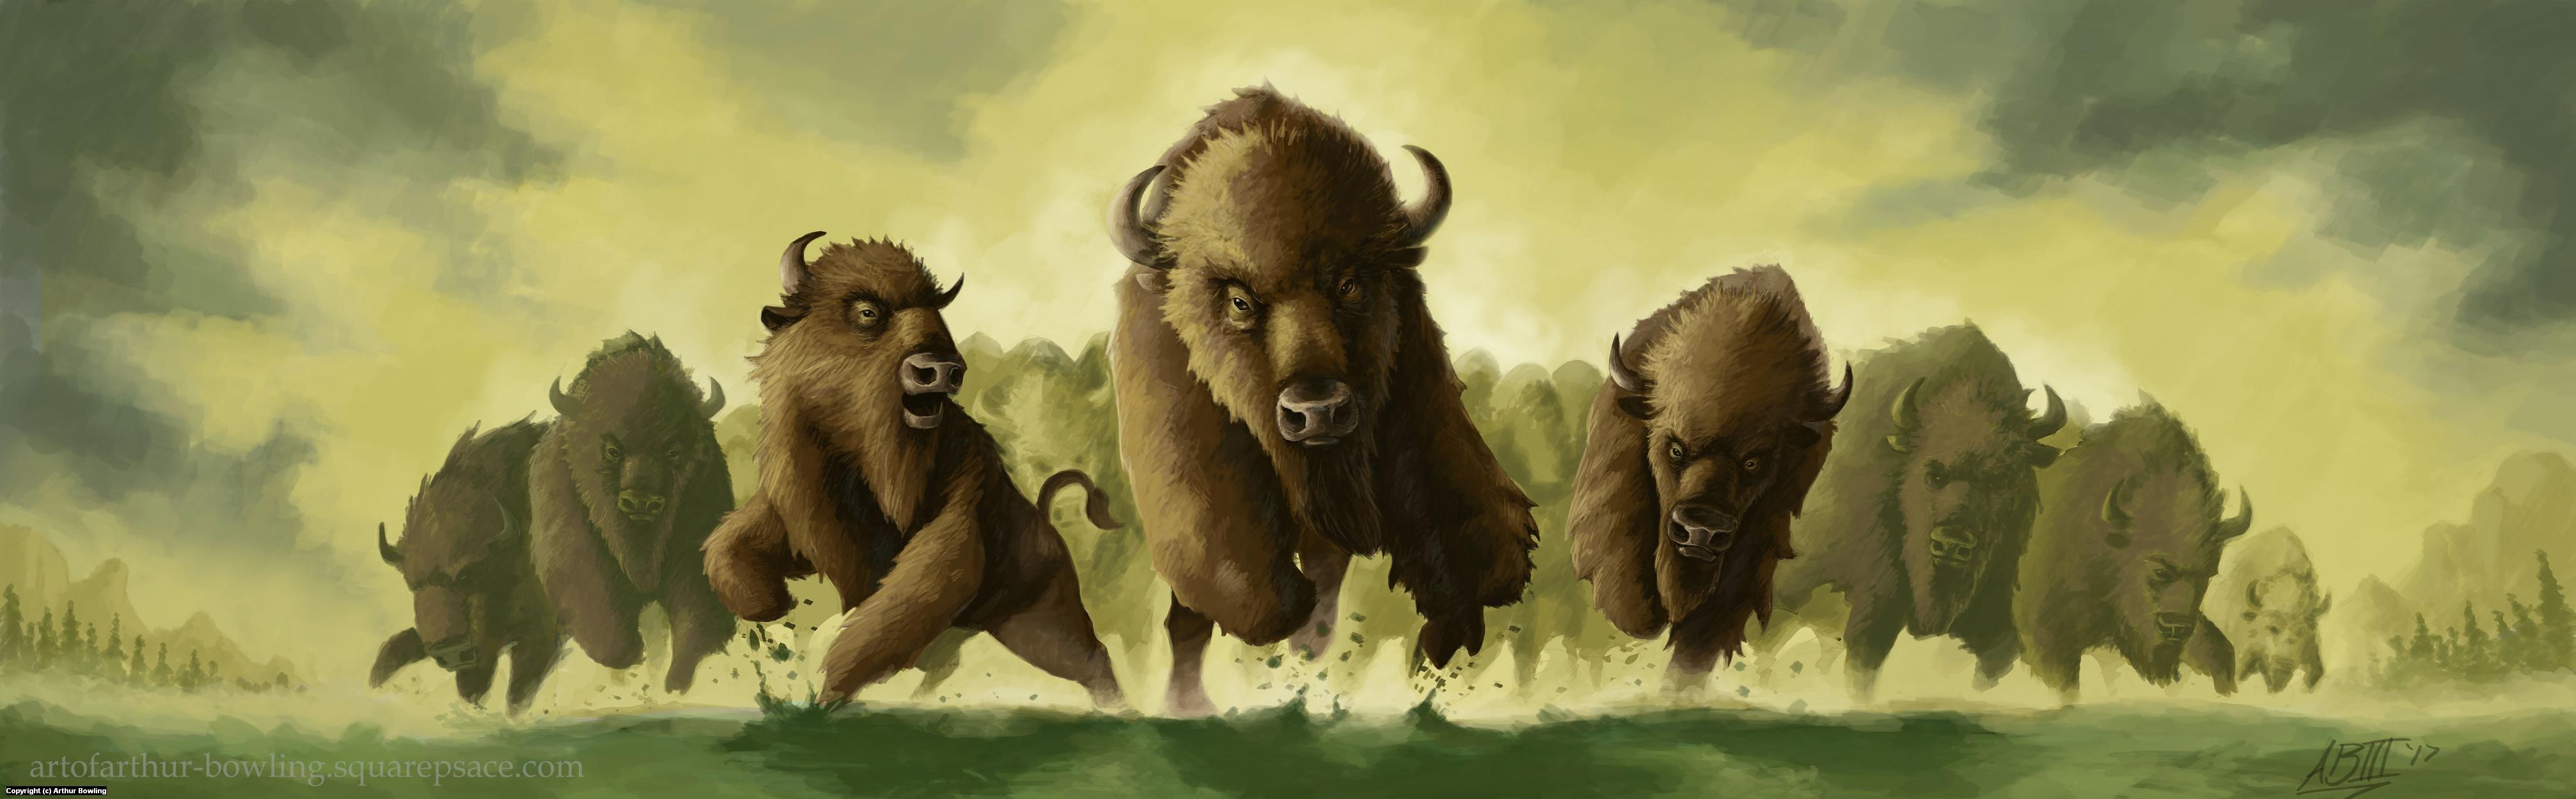 Thundering Herd Artwork by Arthur Bowling